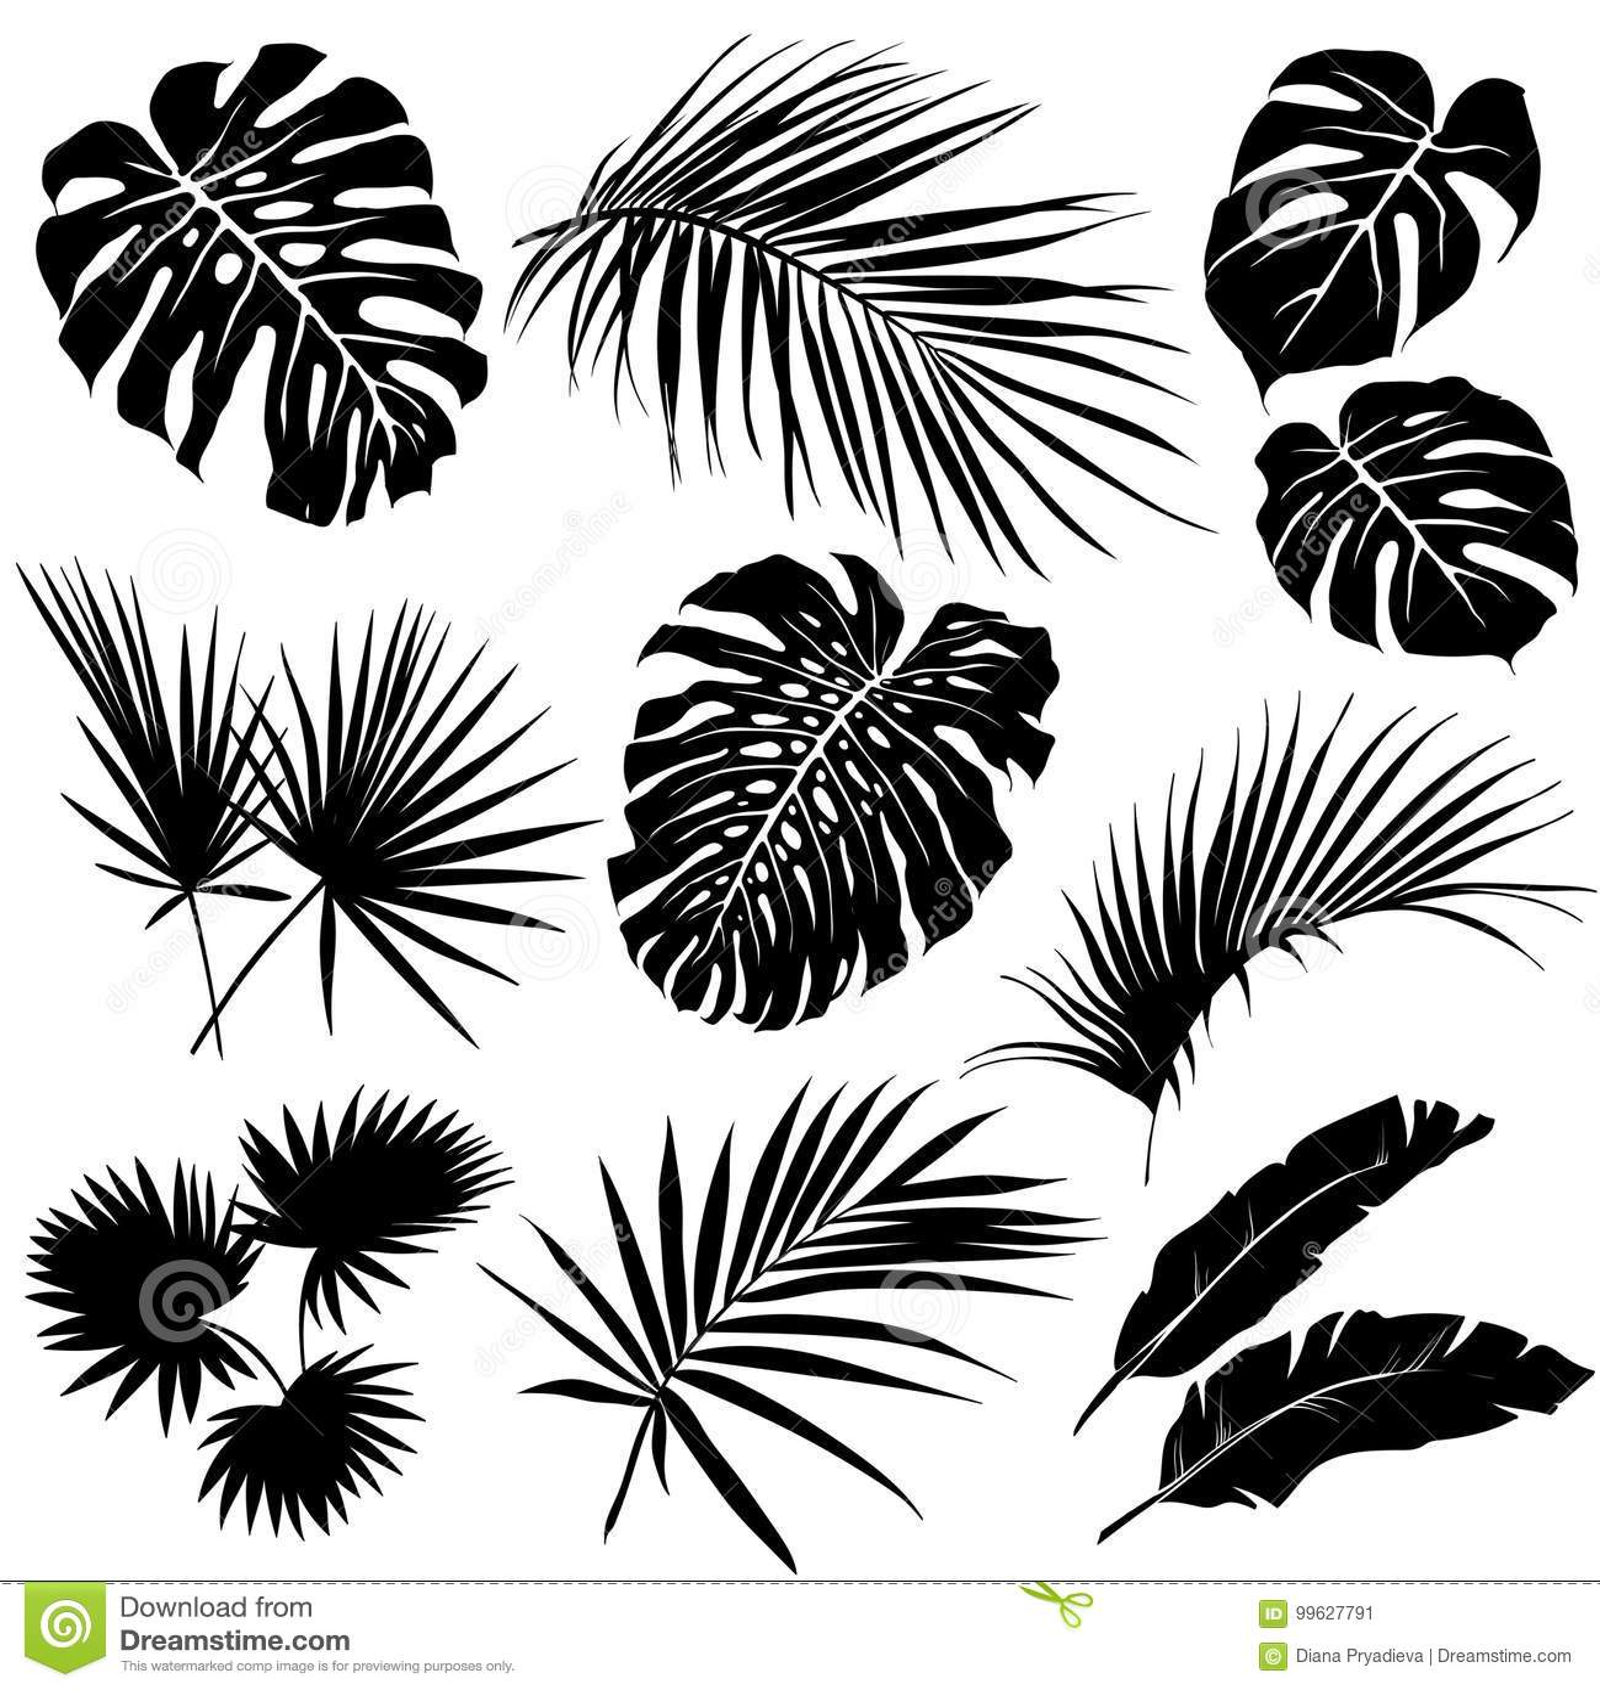 Tropical Leaves Black White Stock Illustrations 24 446 Tropical Leaves Black White Stock Illustrations Vectors Clipart Dreamstime Vectores, imágenes y arte vectorial de stock sobre. dreamstime com